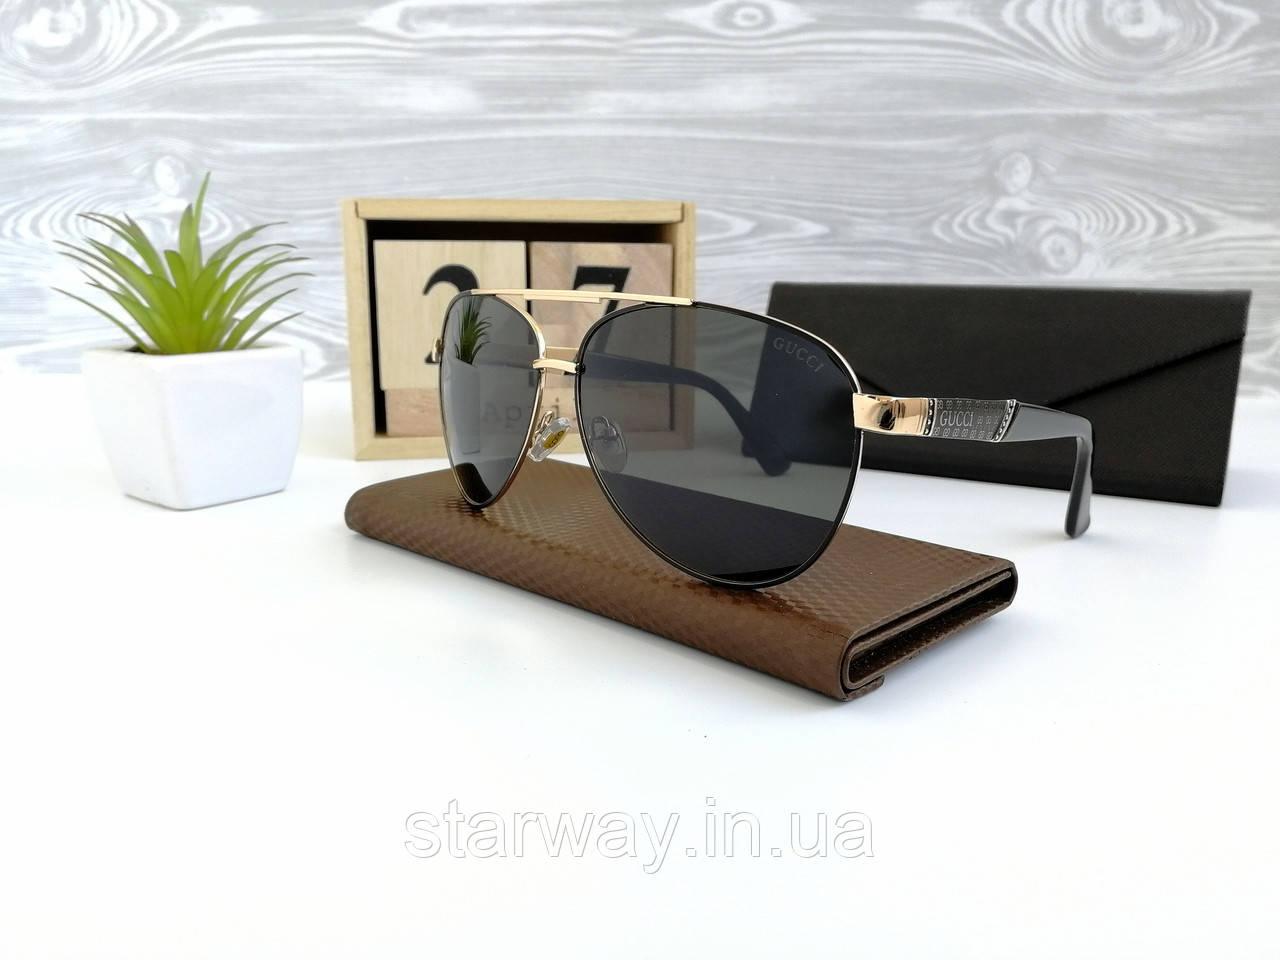 Солнцезащитные очки Gucci полароид | в стиле Гуччи